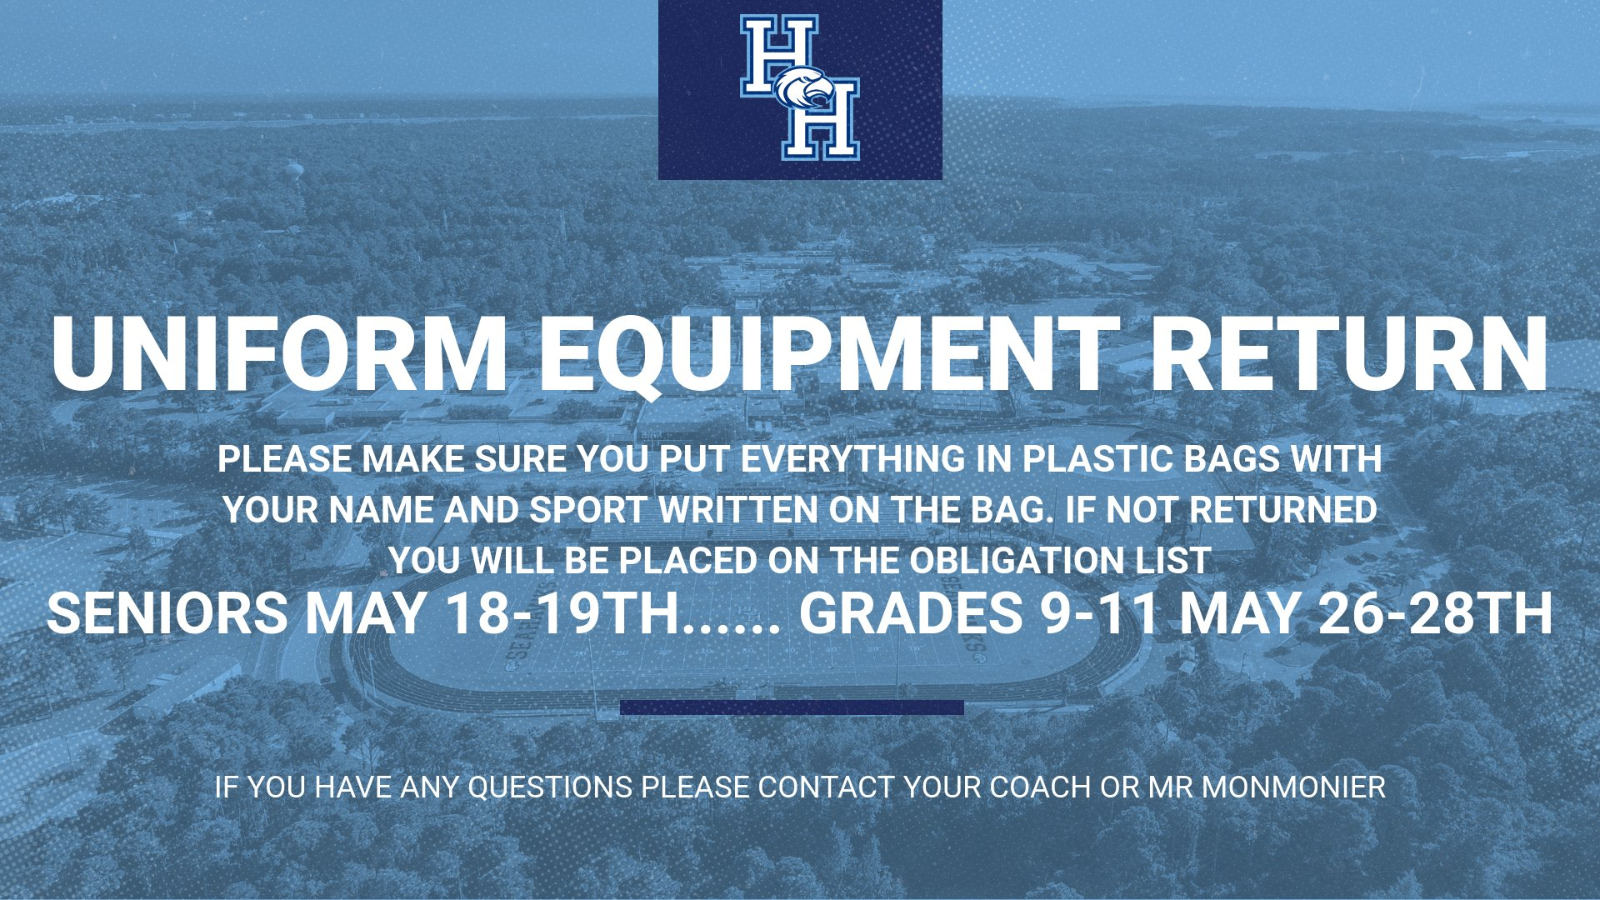 Information for Uniform Equipment Return